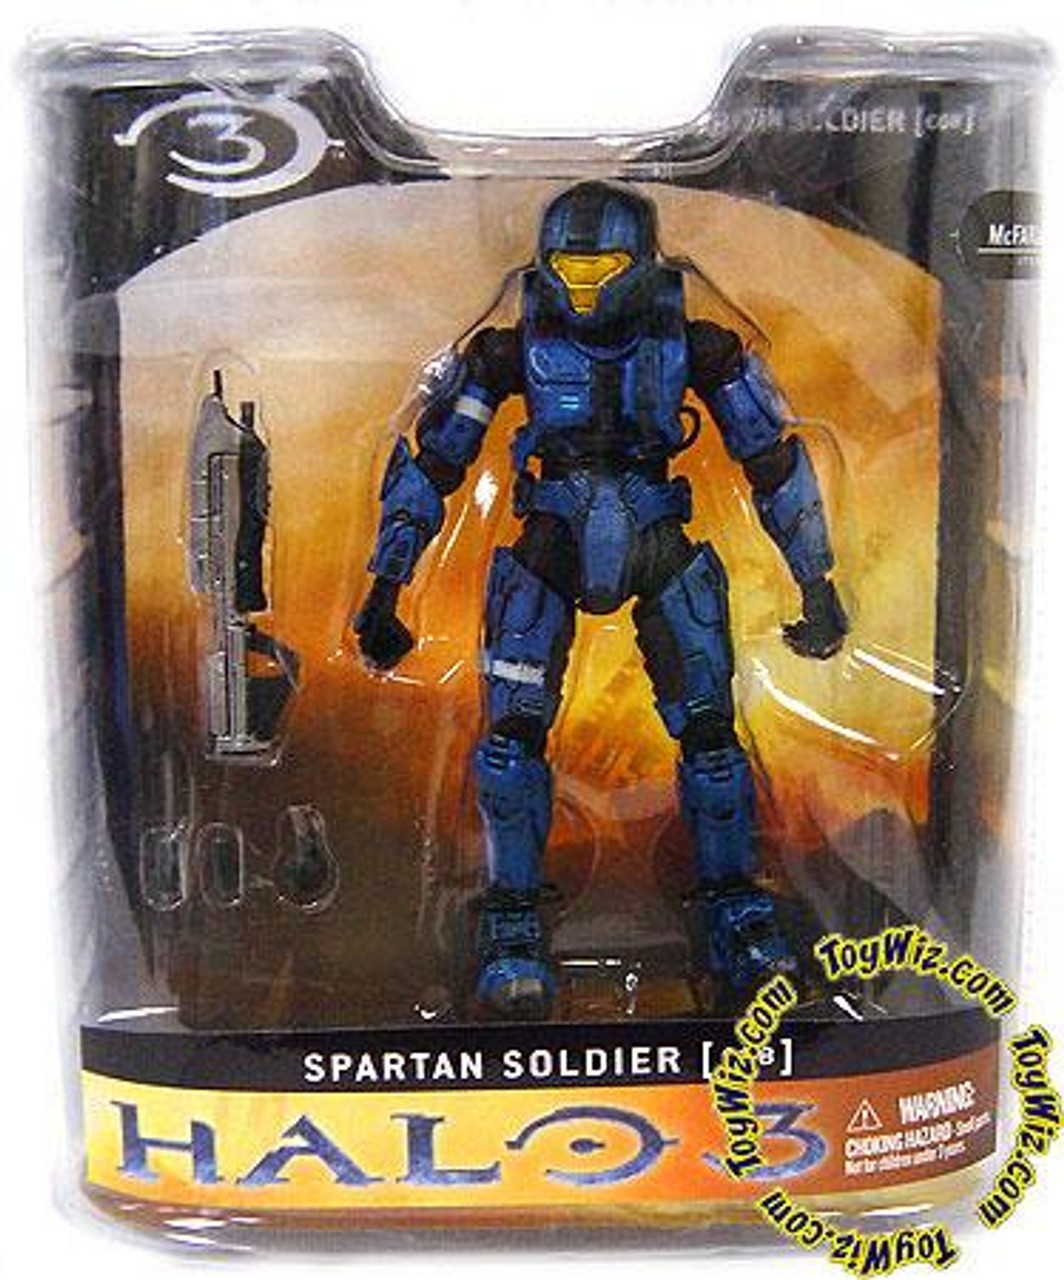 McFarlane Toys Halo 3 Series 1 Spartan Soldier CQB Exclusive Action Figure [Blue]